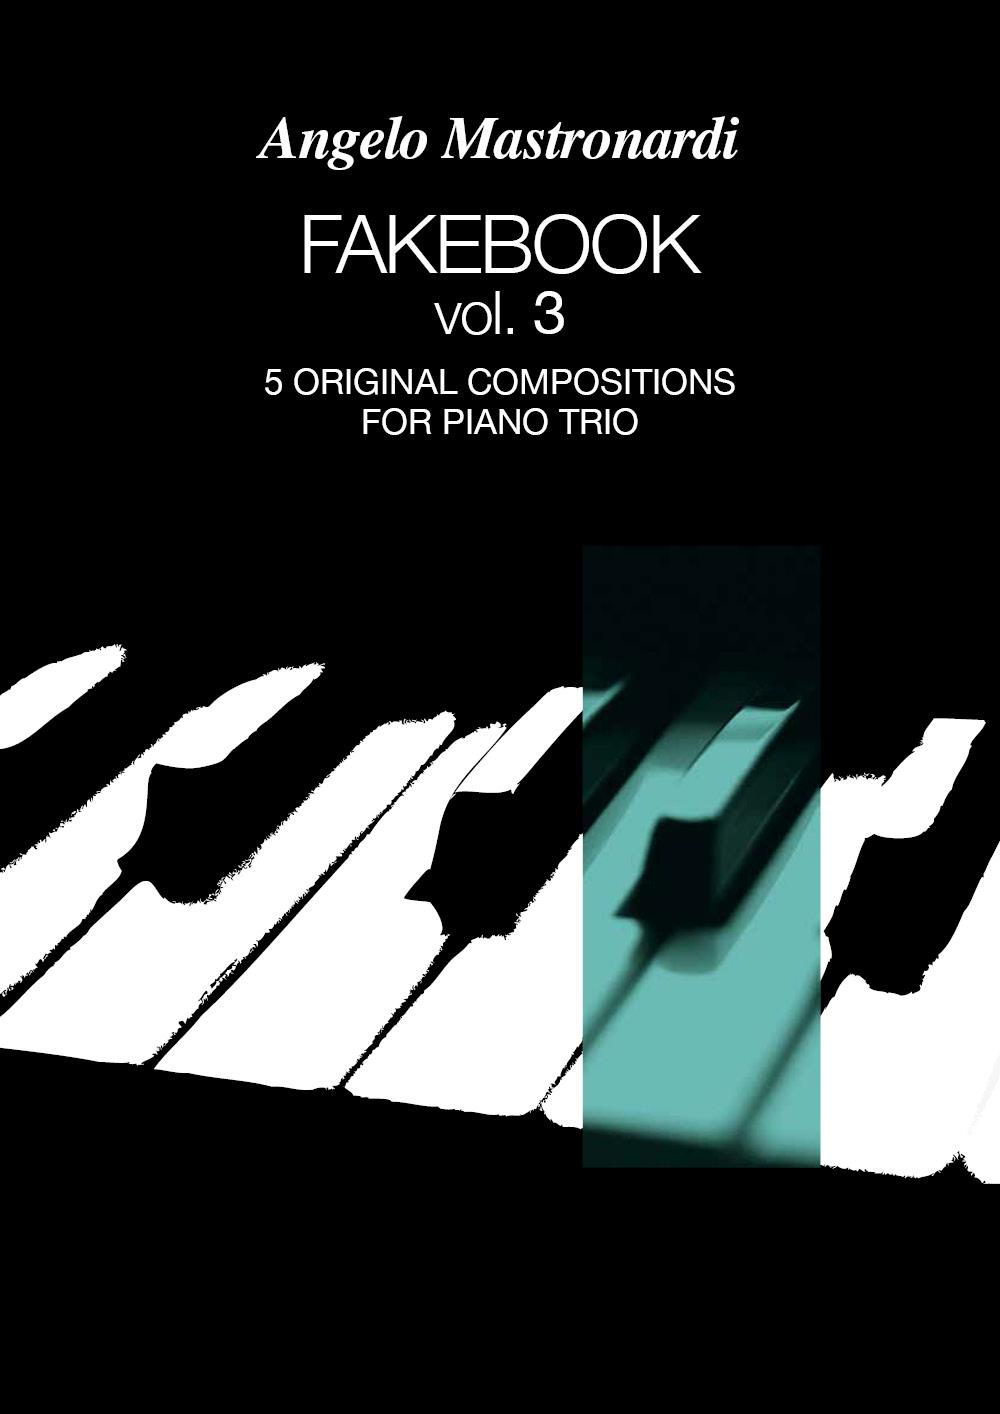 Fakebook Vol. 3. 5 original compositions for piano trio